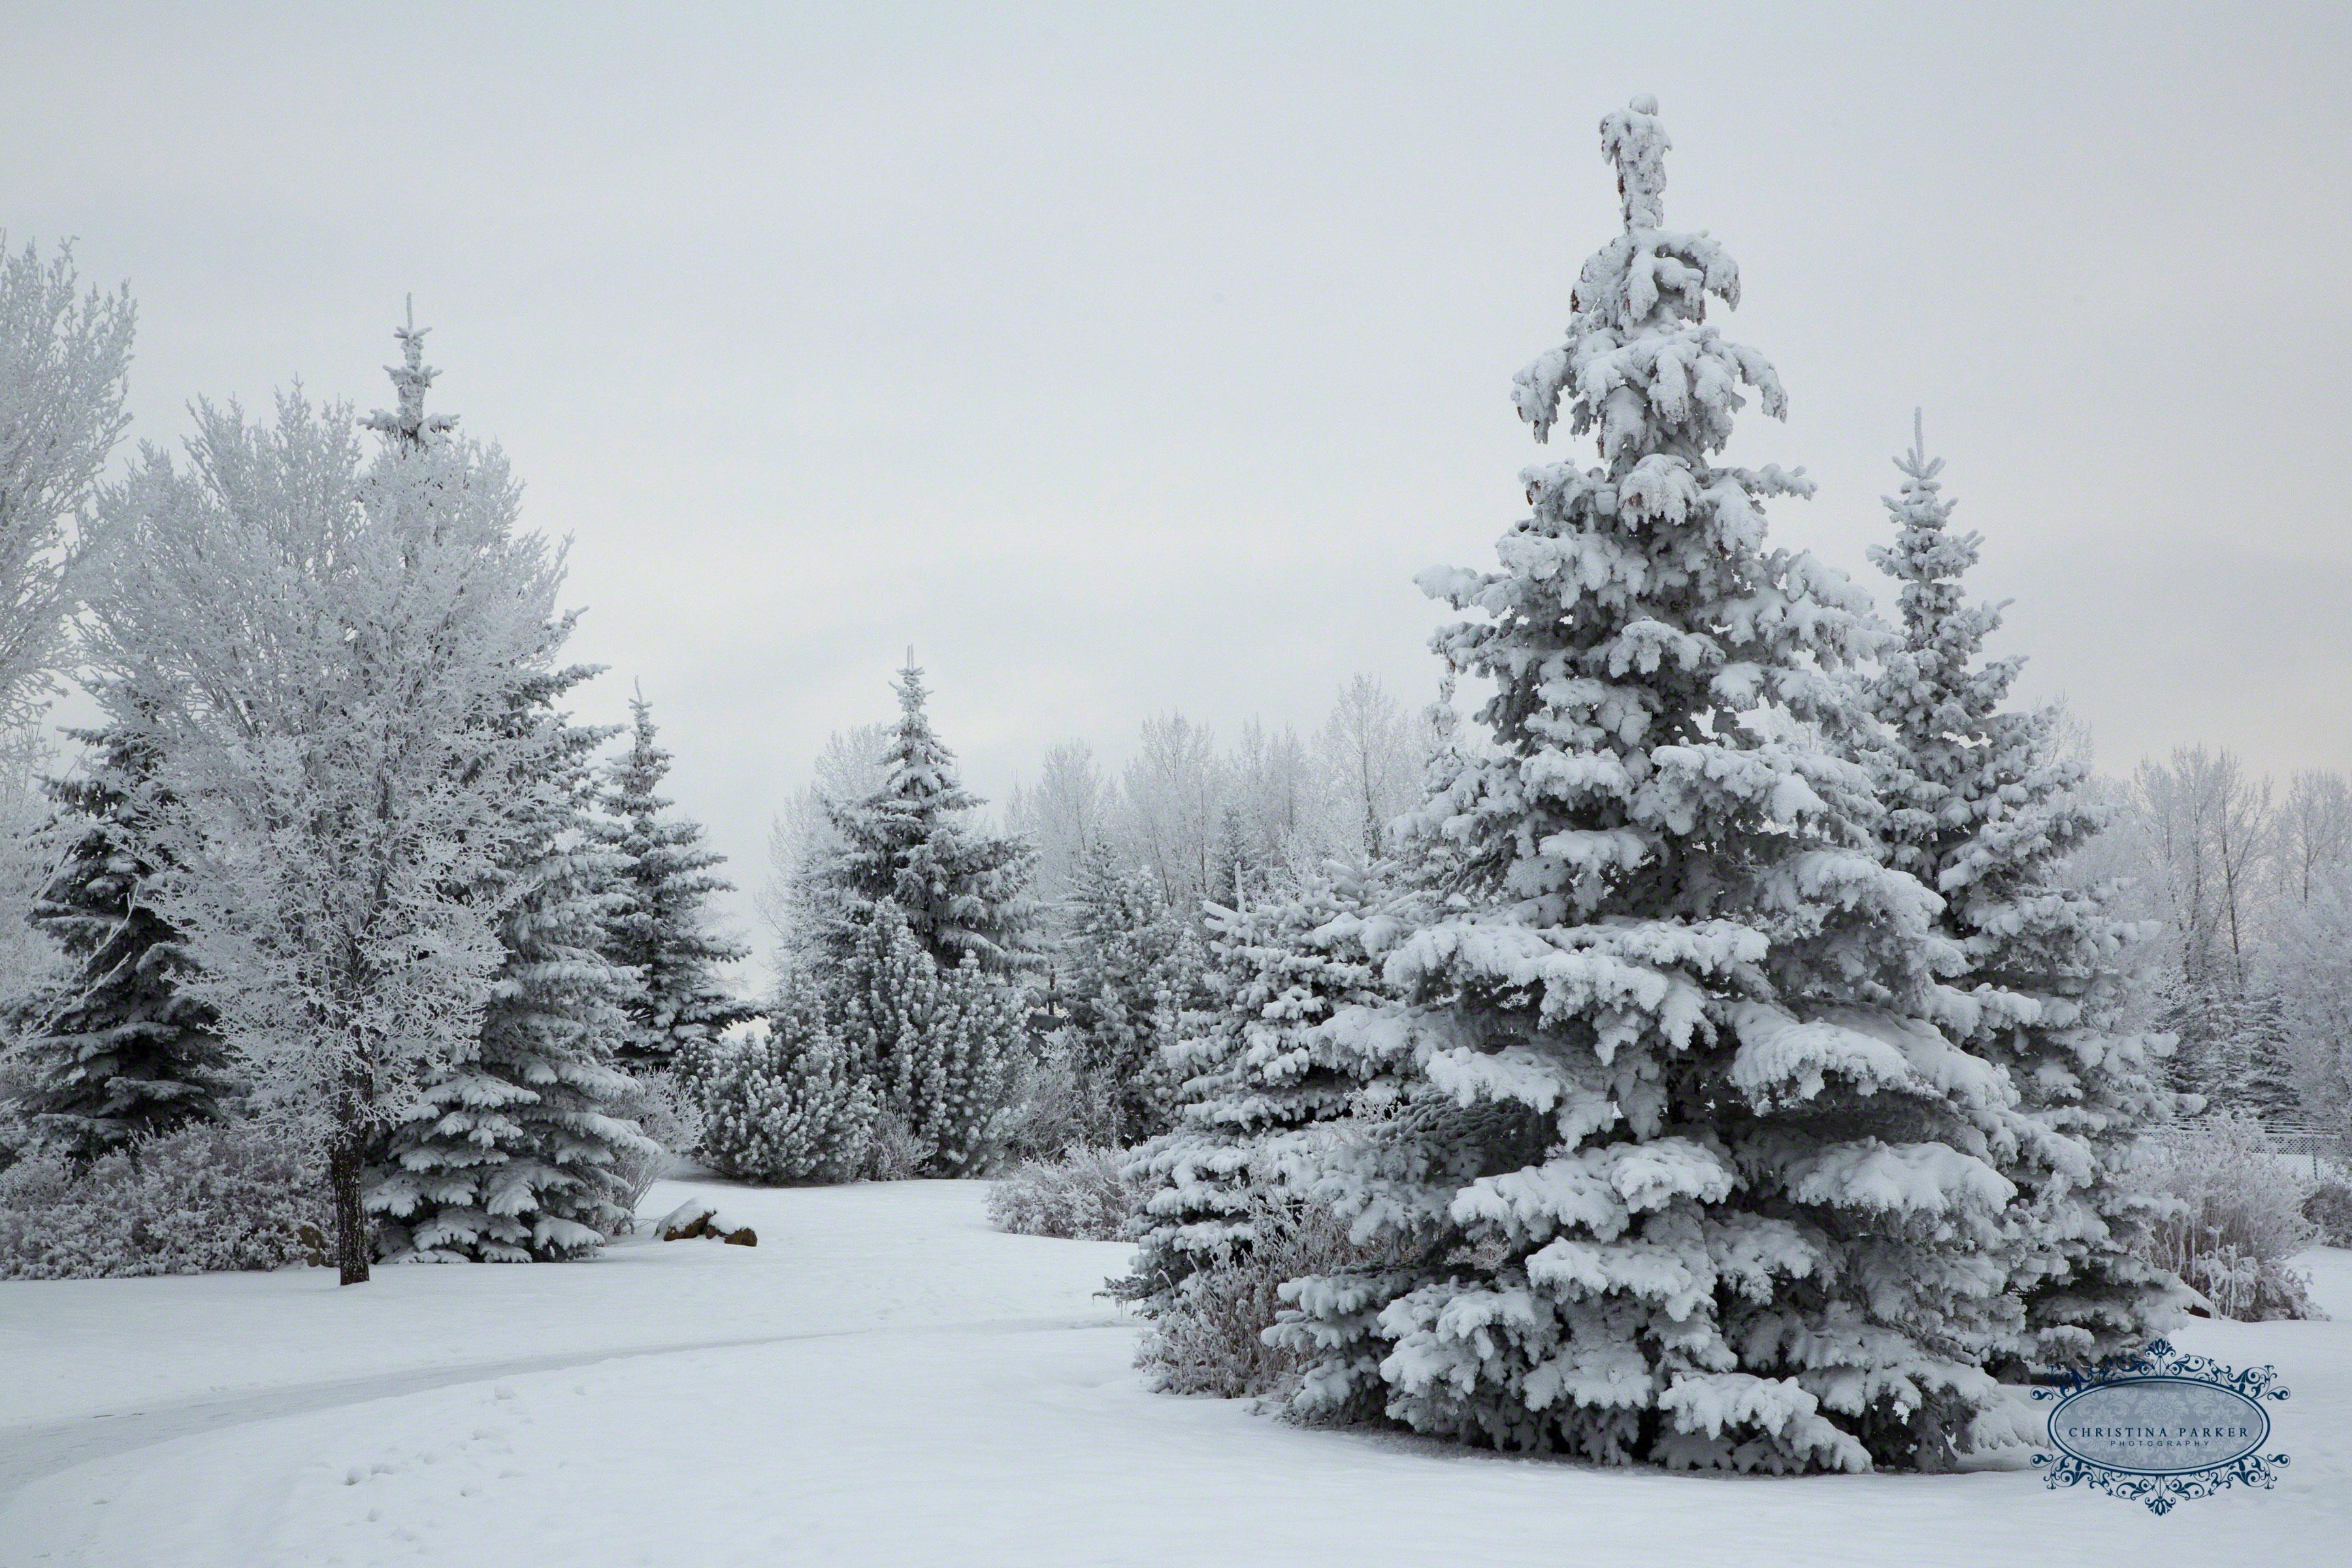 3a2a4522 Snowy Trees 8 215 12 Wm Dm Christina Parker Photography